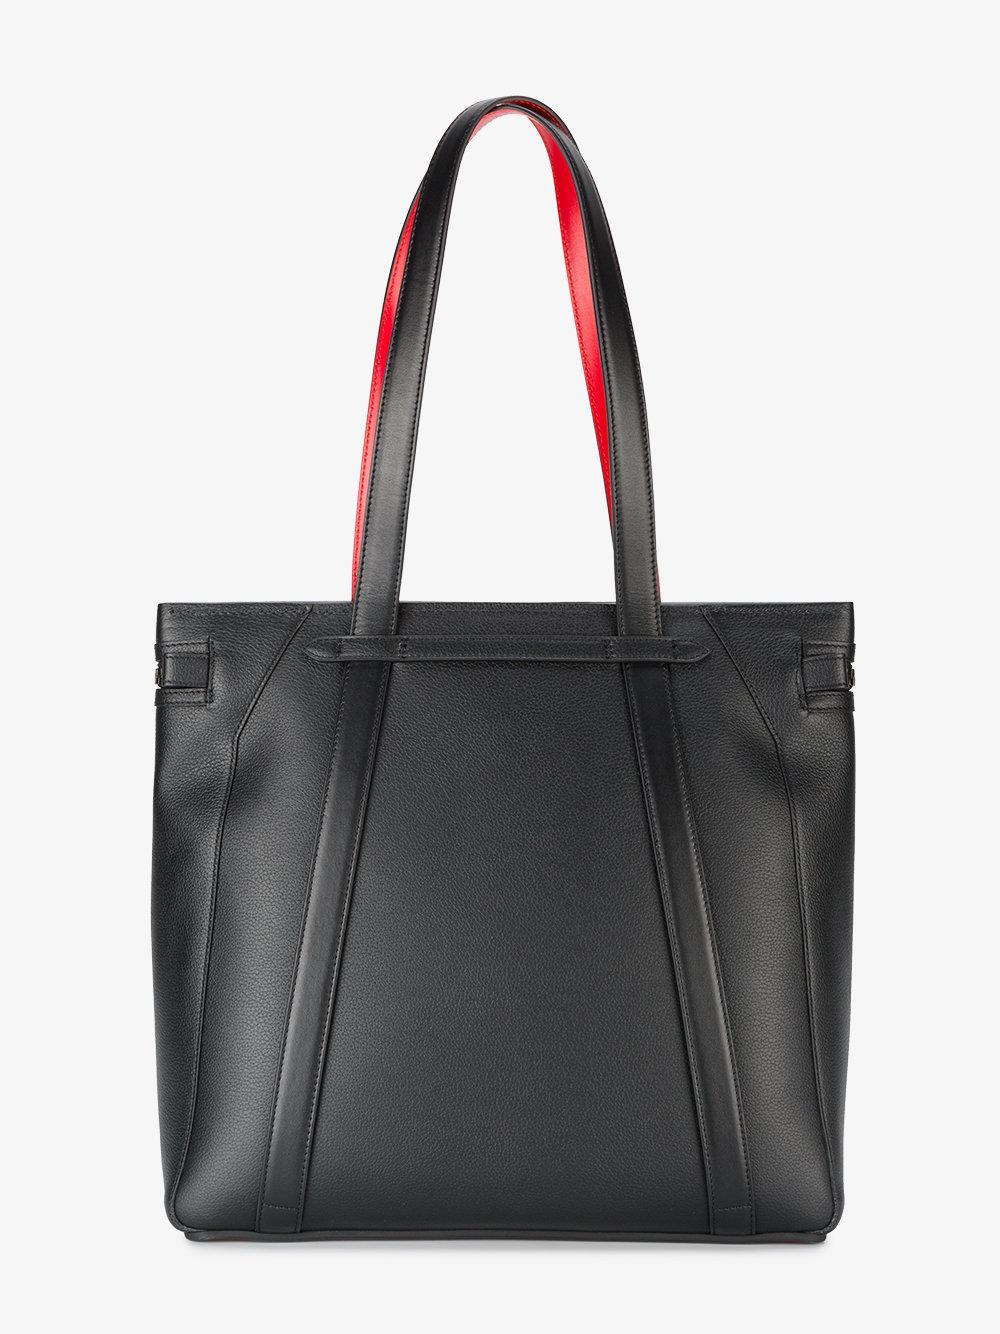 Christian Louboutin Leather Cabado Embellished Tote Bag in Black